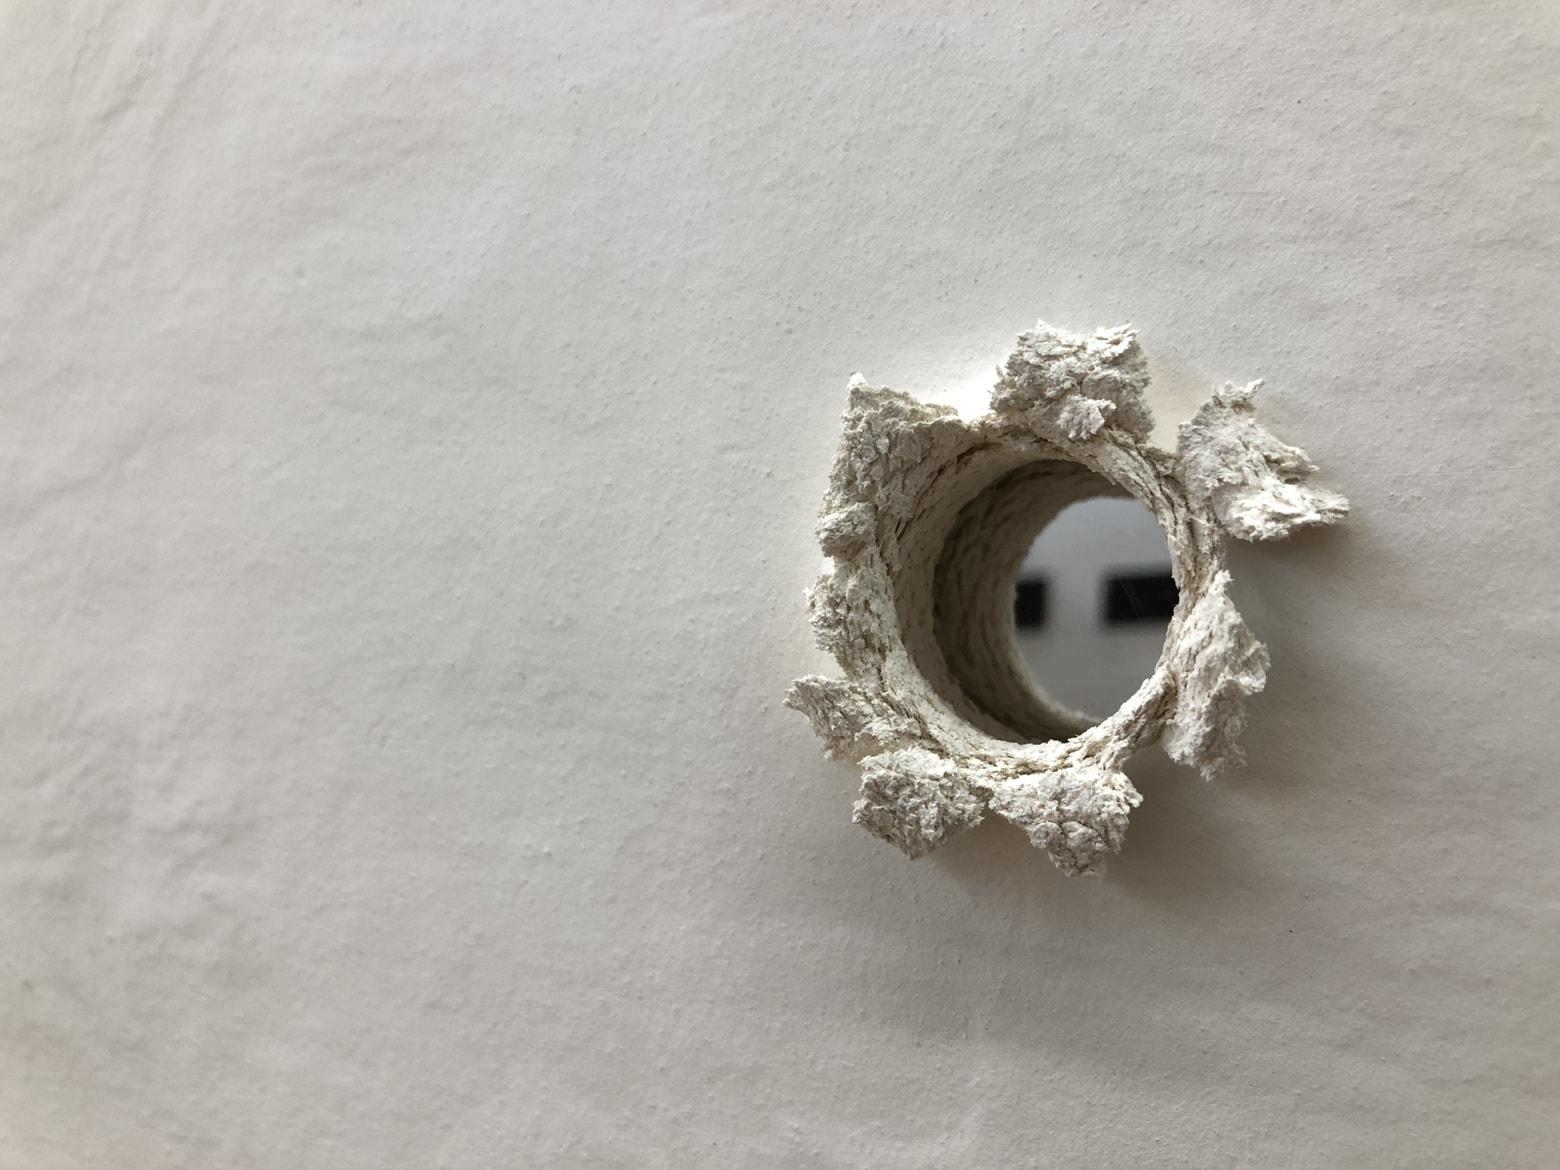 'Ricochet I' number 2, detail, 2018, stoneware ceramics and acrylic mirror, 50 x 50 cm